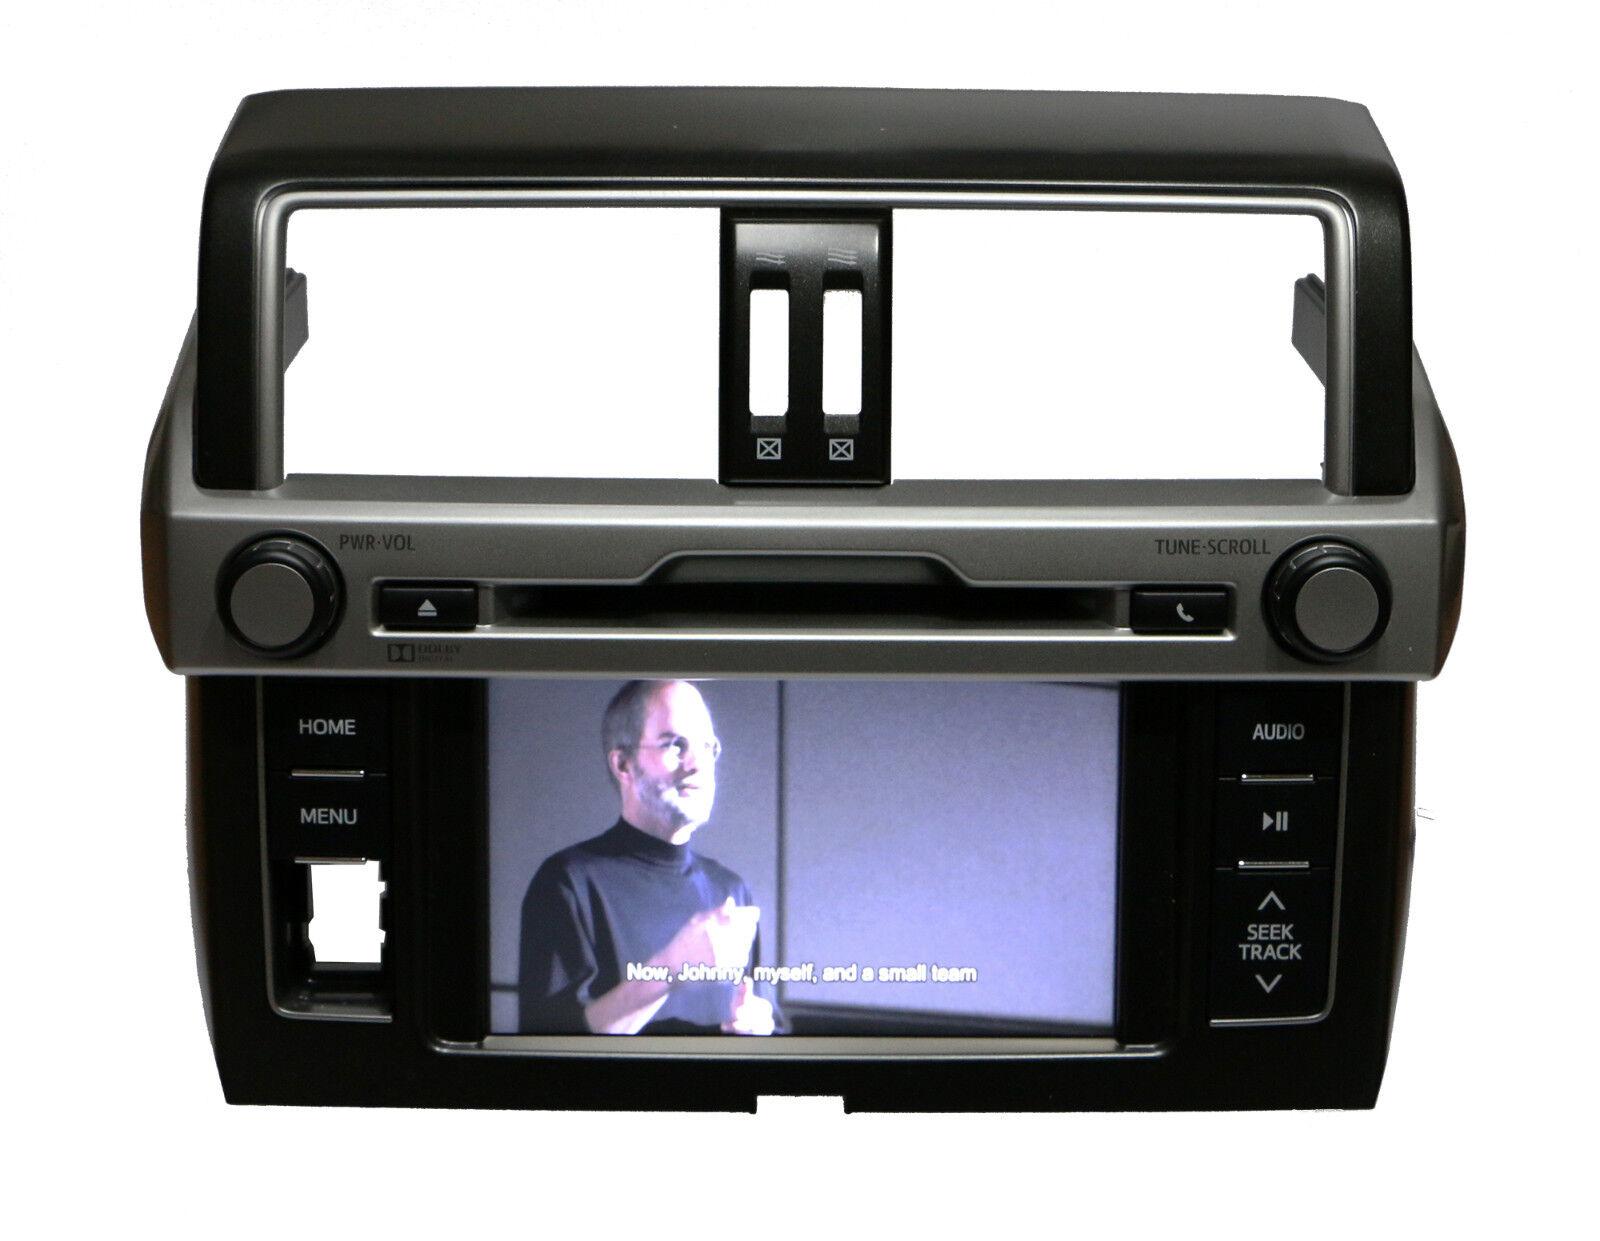 4Toyota Land Cruiser Prado DVD Player Stereo Radio w/ Hazard Switch 86140-60130